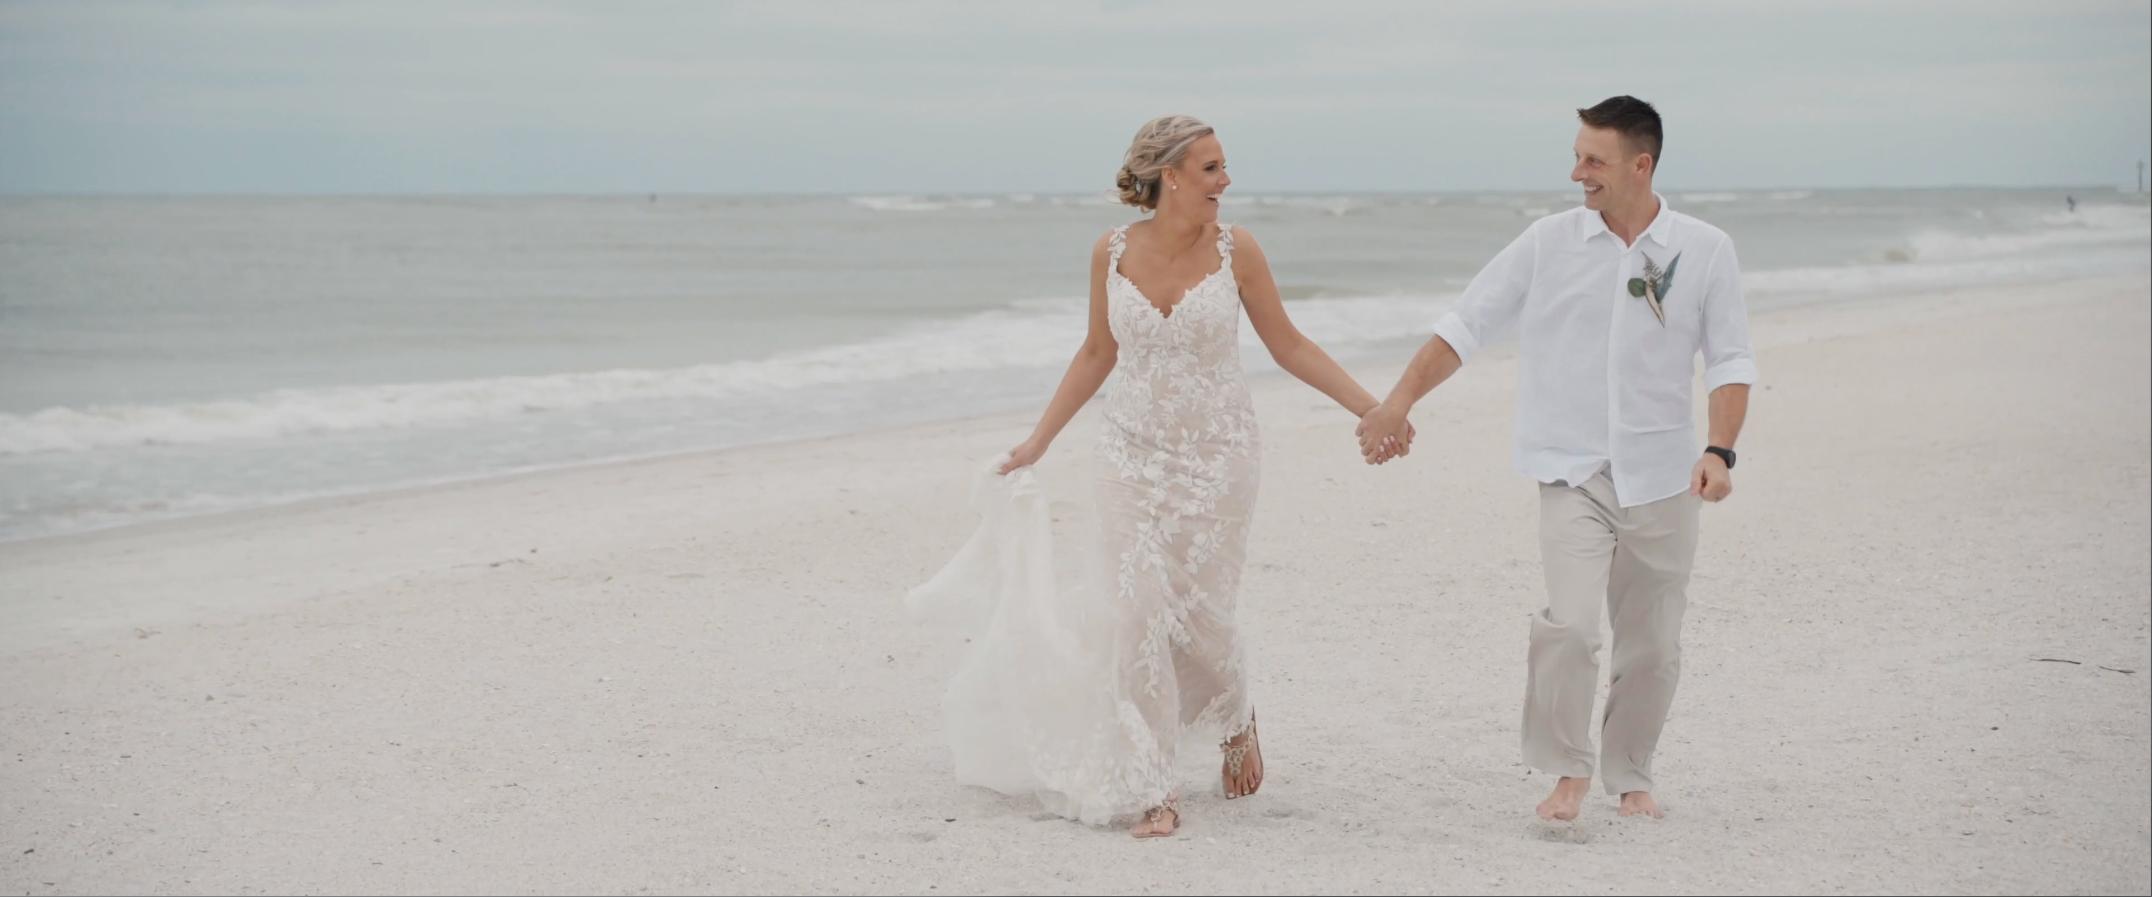 Brenna + Joe | St. Pete Beach, Florida | Postcard Inn